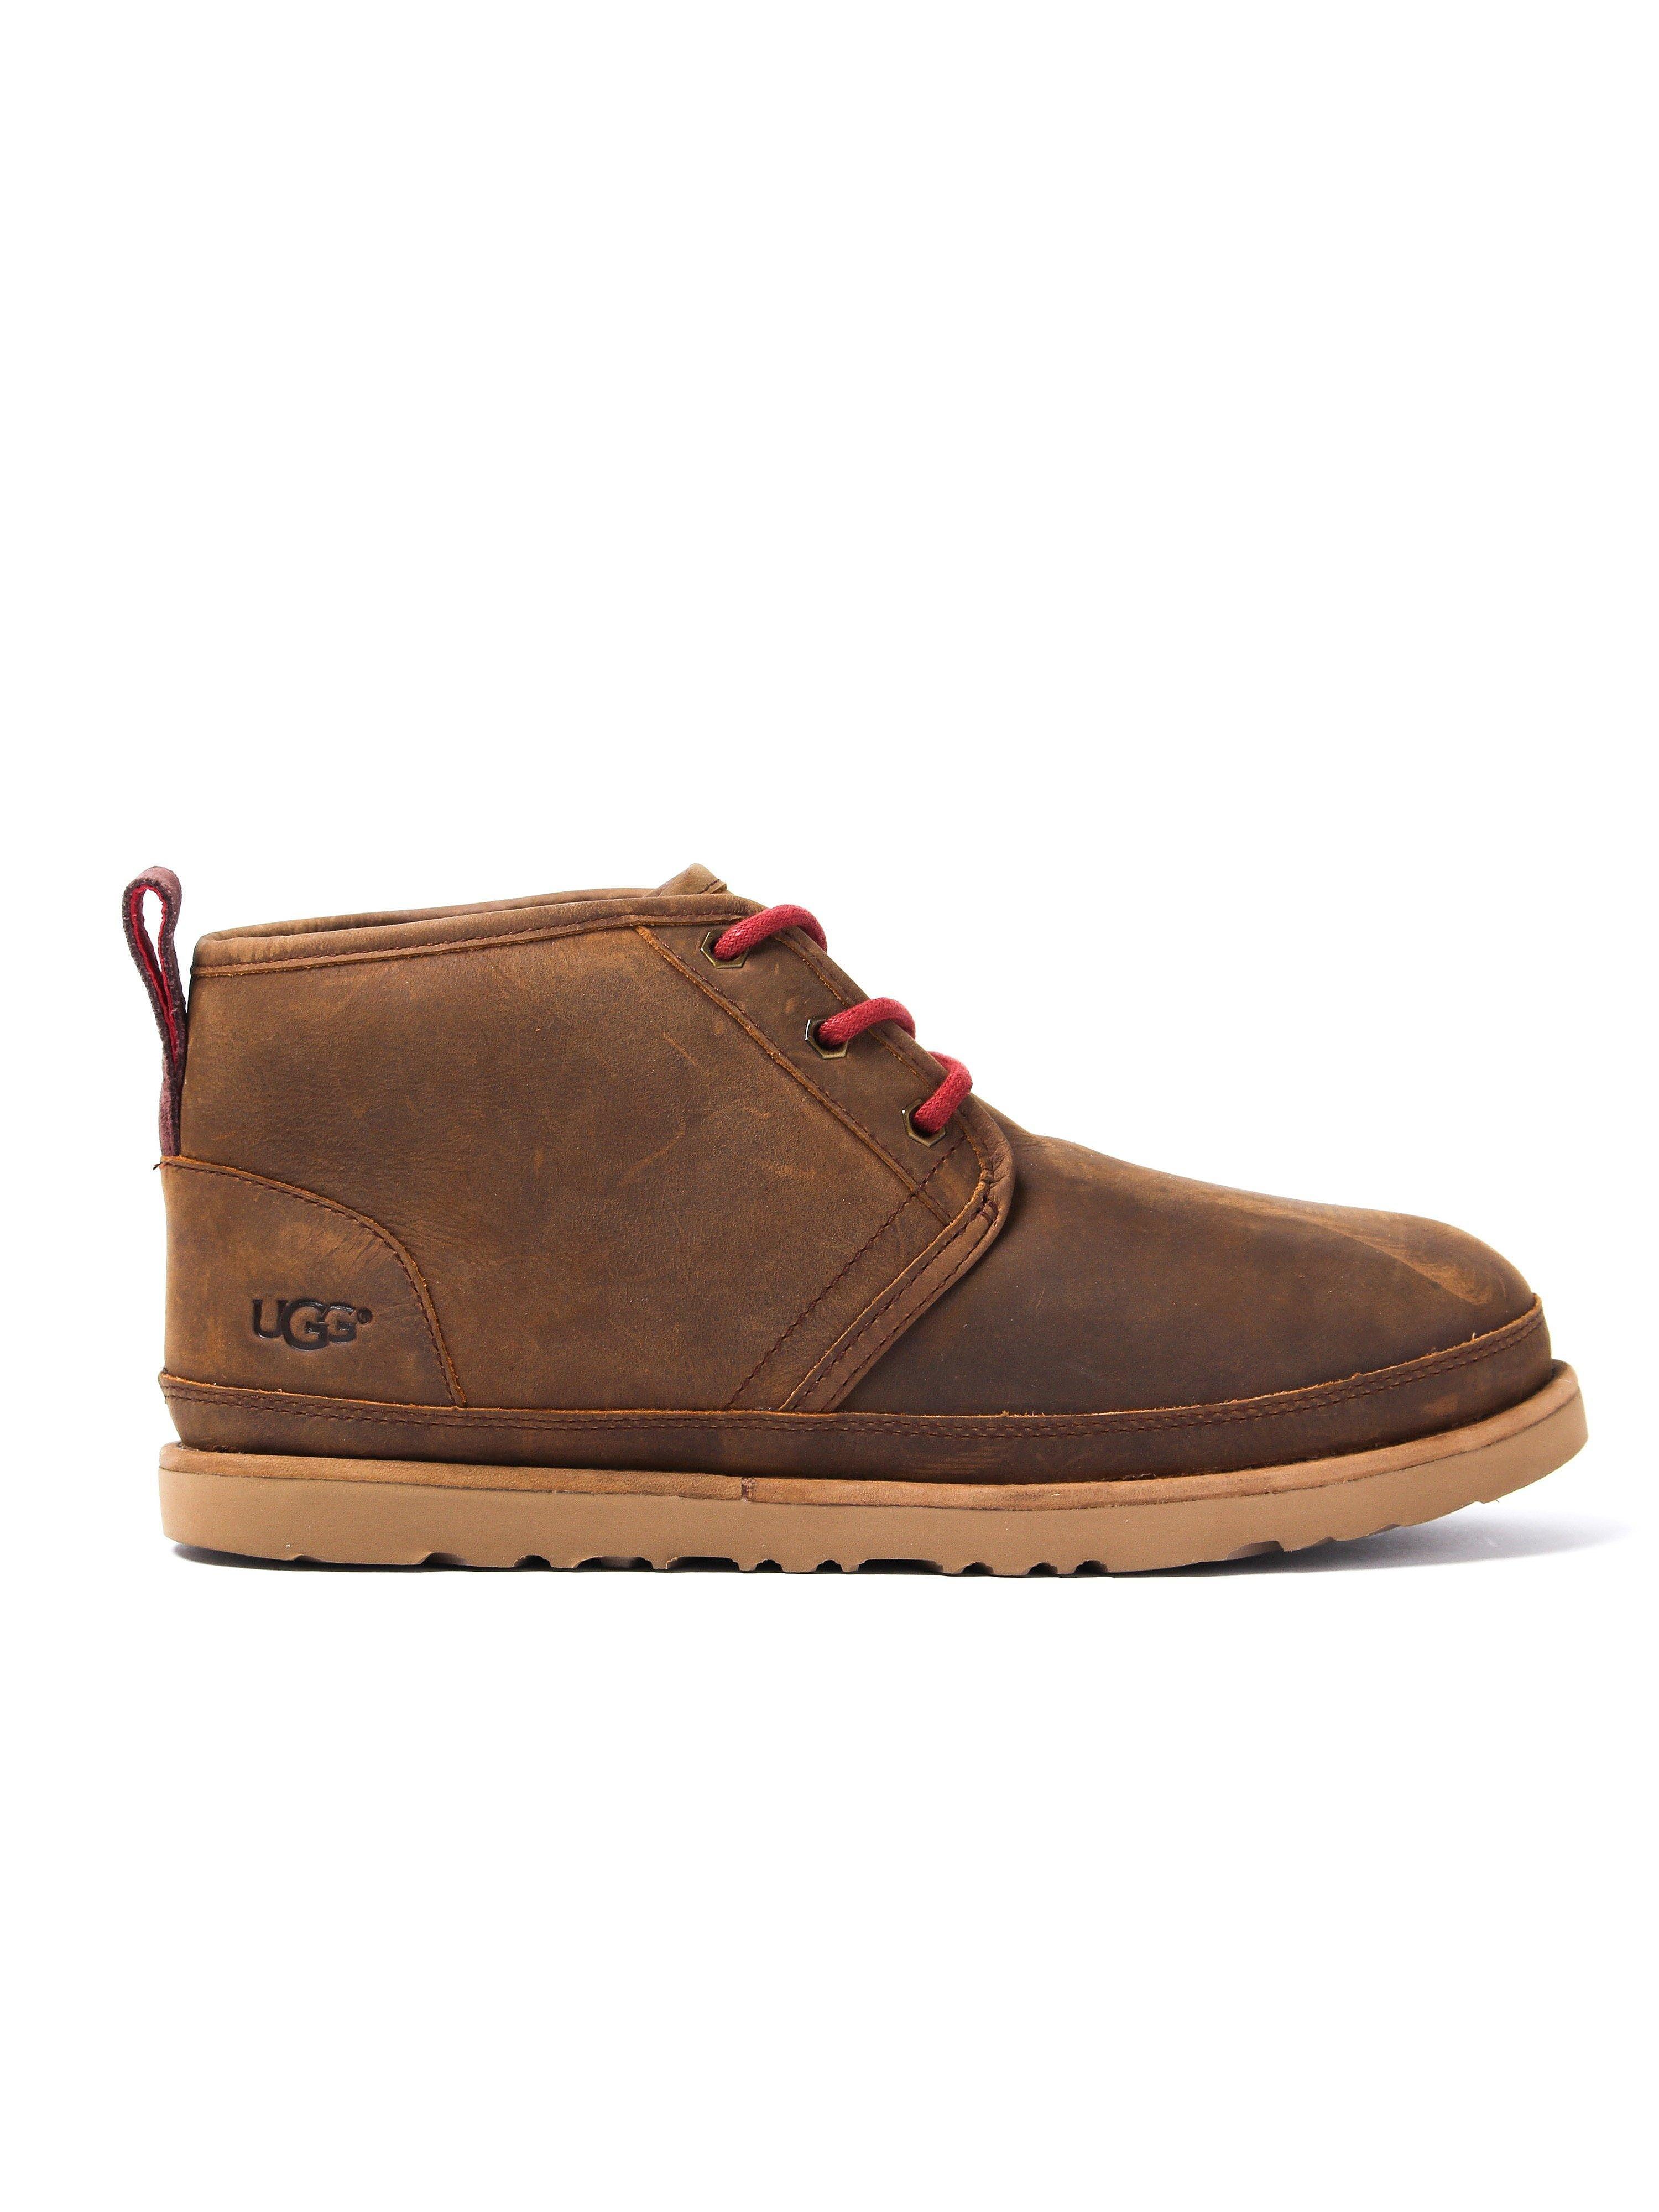 UGG Men's M Neumel Waterproof Boots - Tan Suede